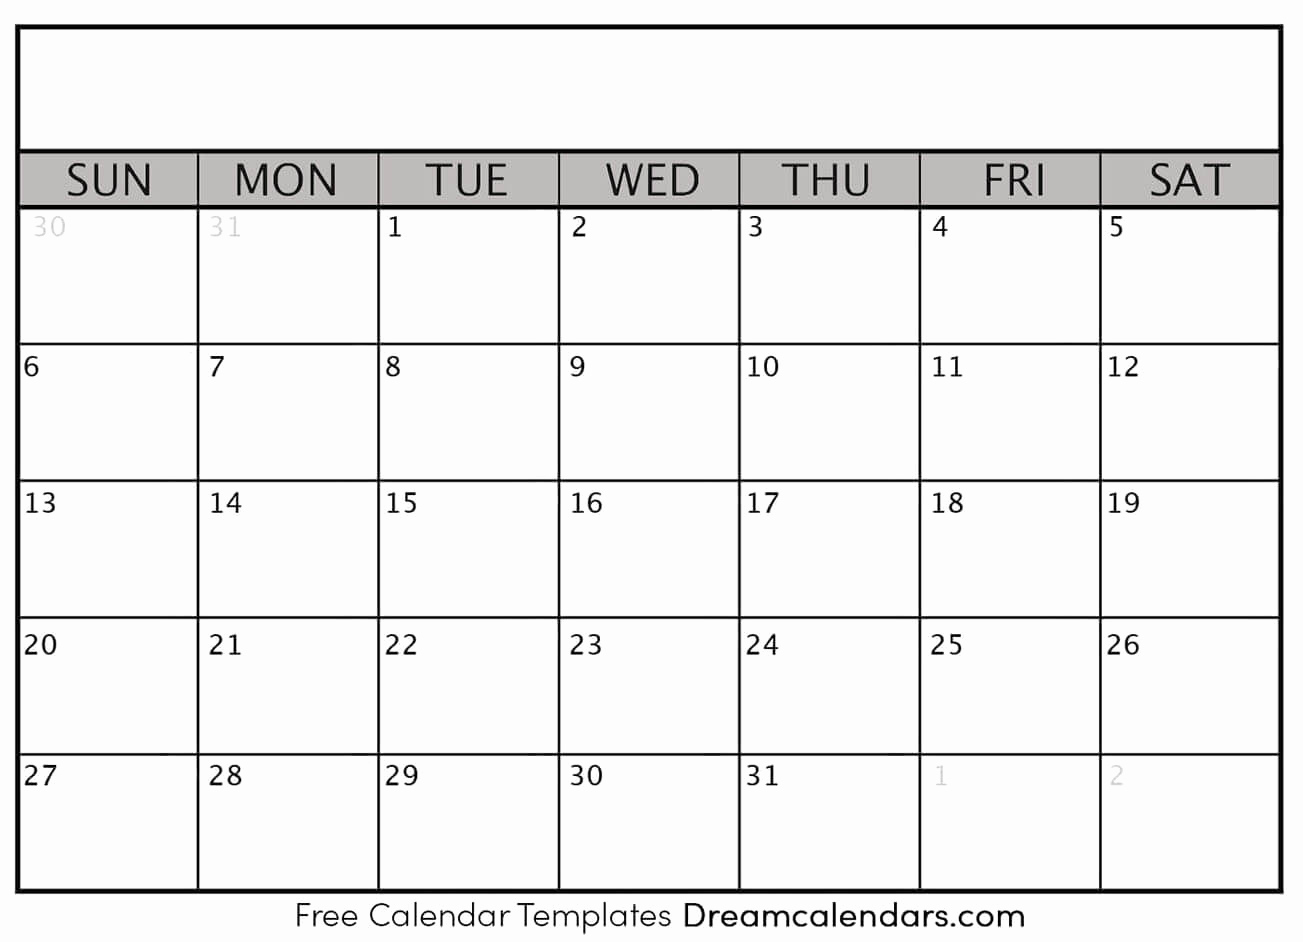 Blank Weekly Calendar Template Weekly Blank Calendar Landscape 03